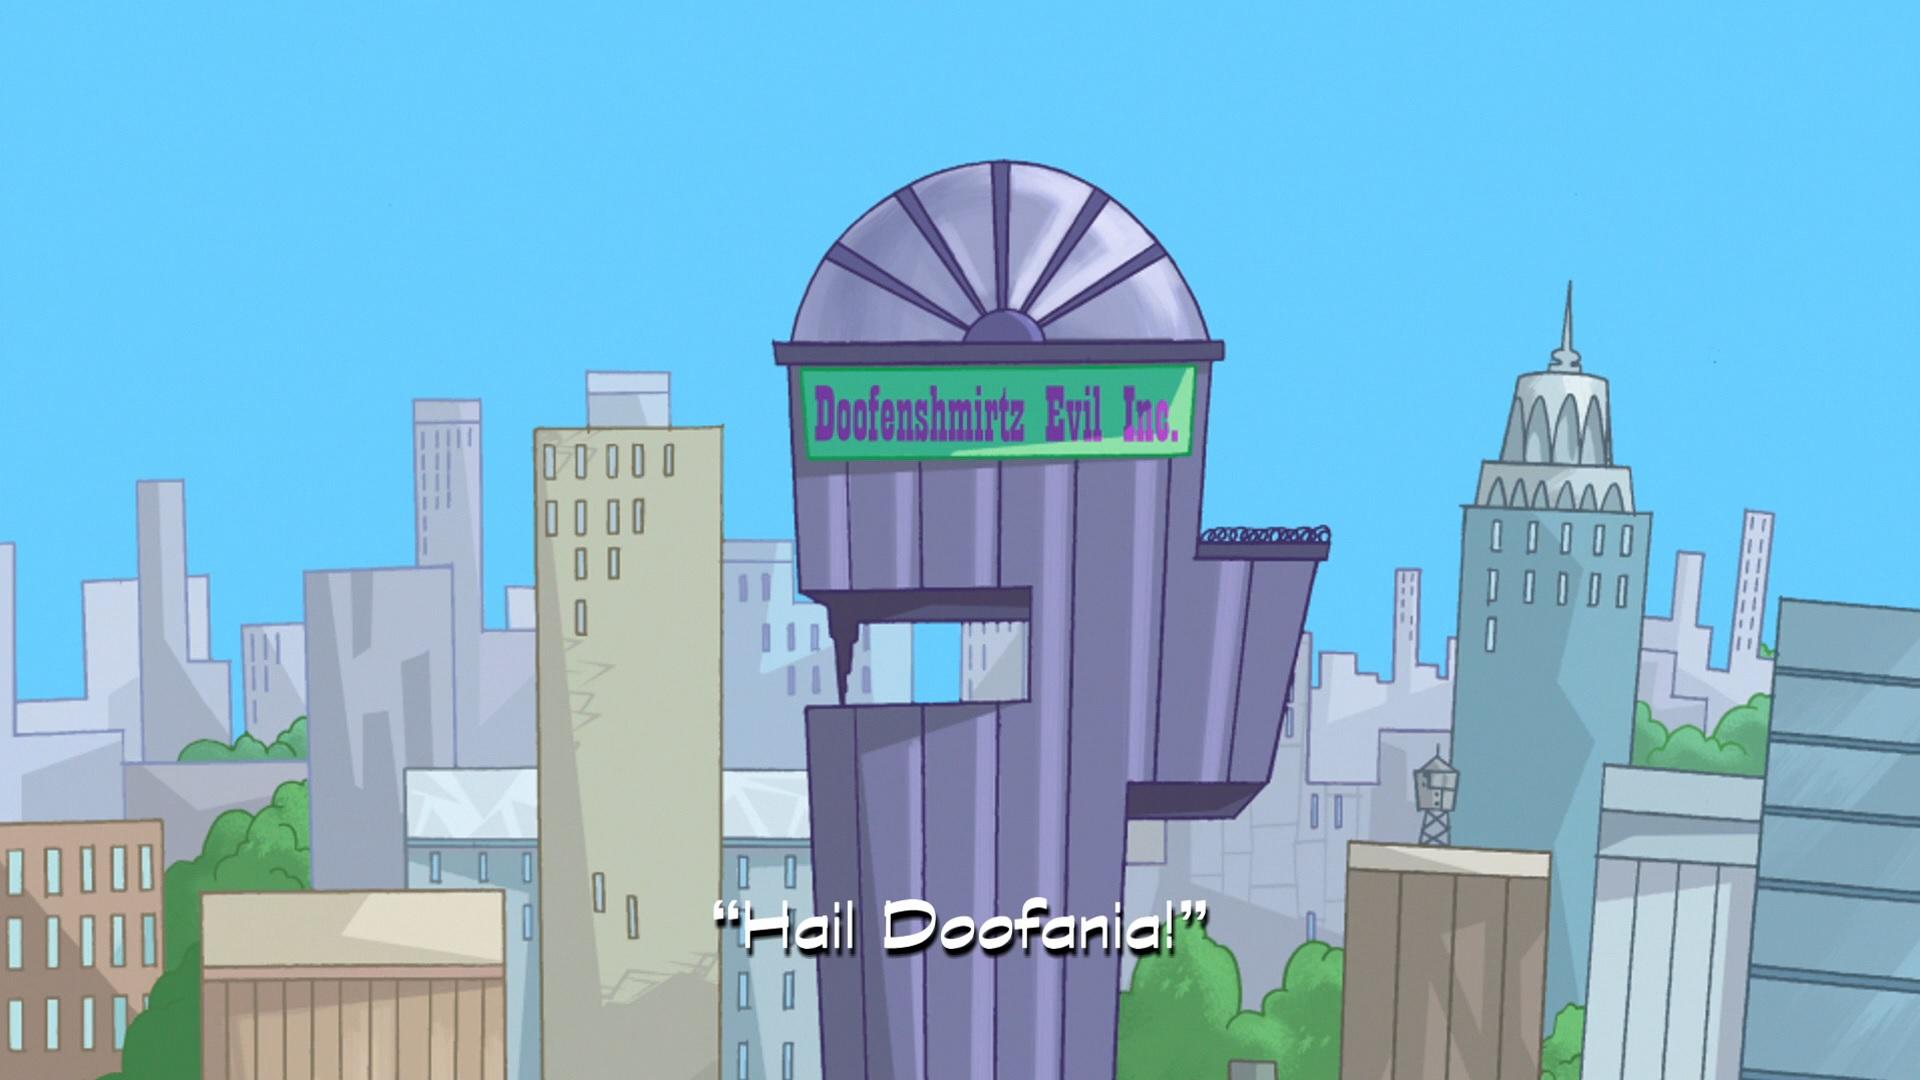 File:Hail Doofania! title card.jpg